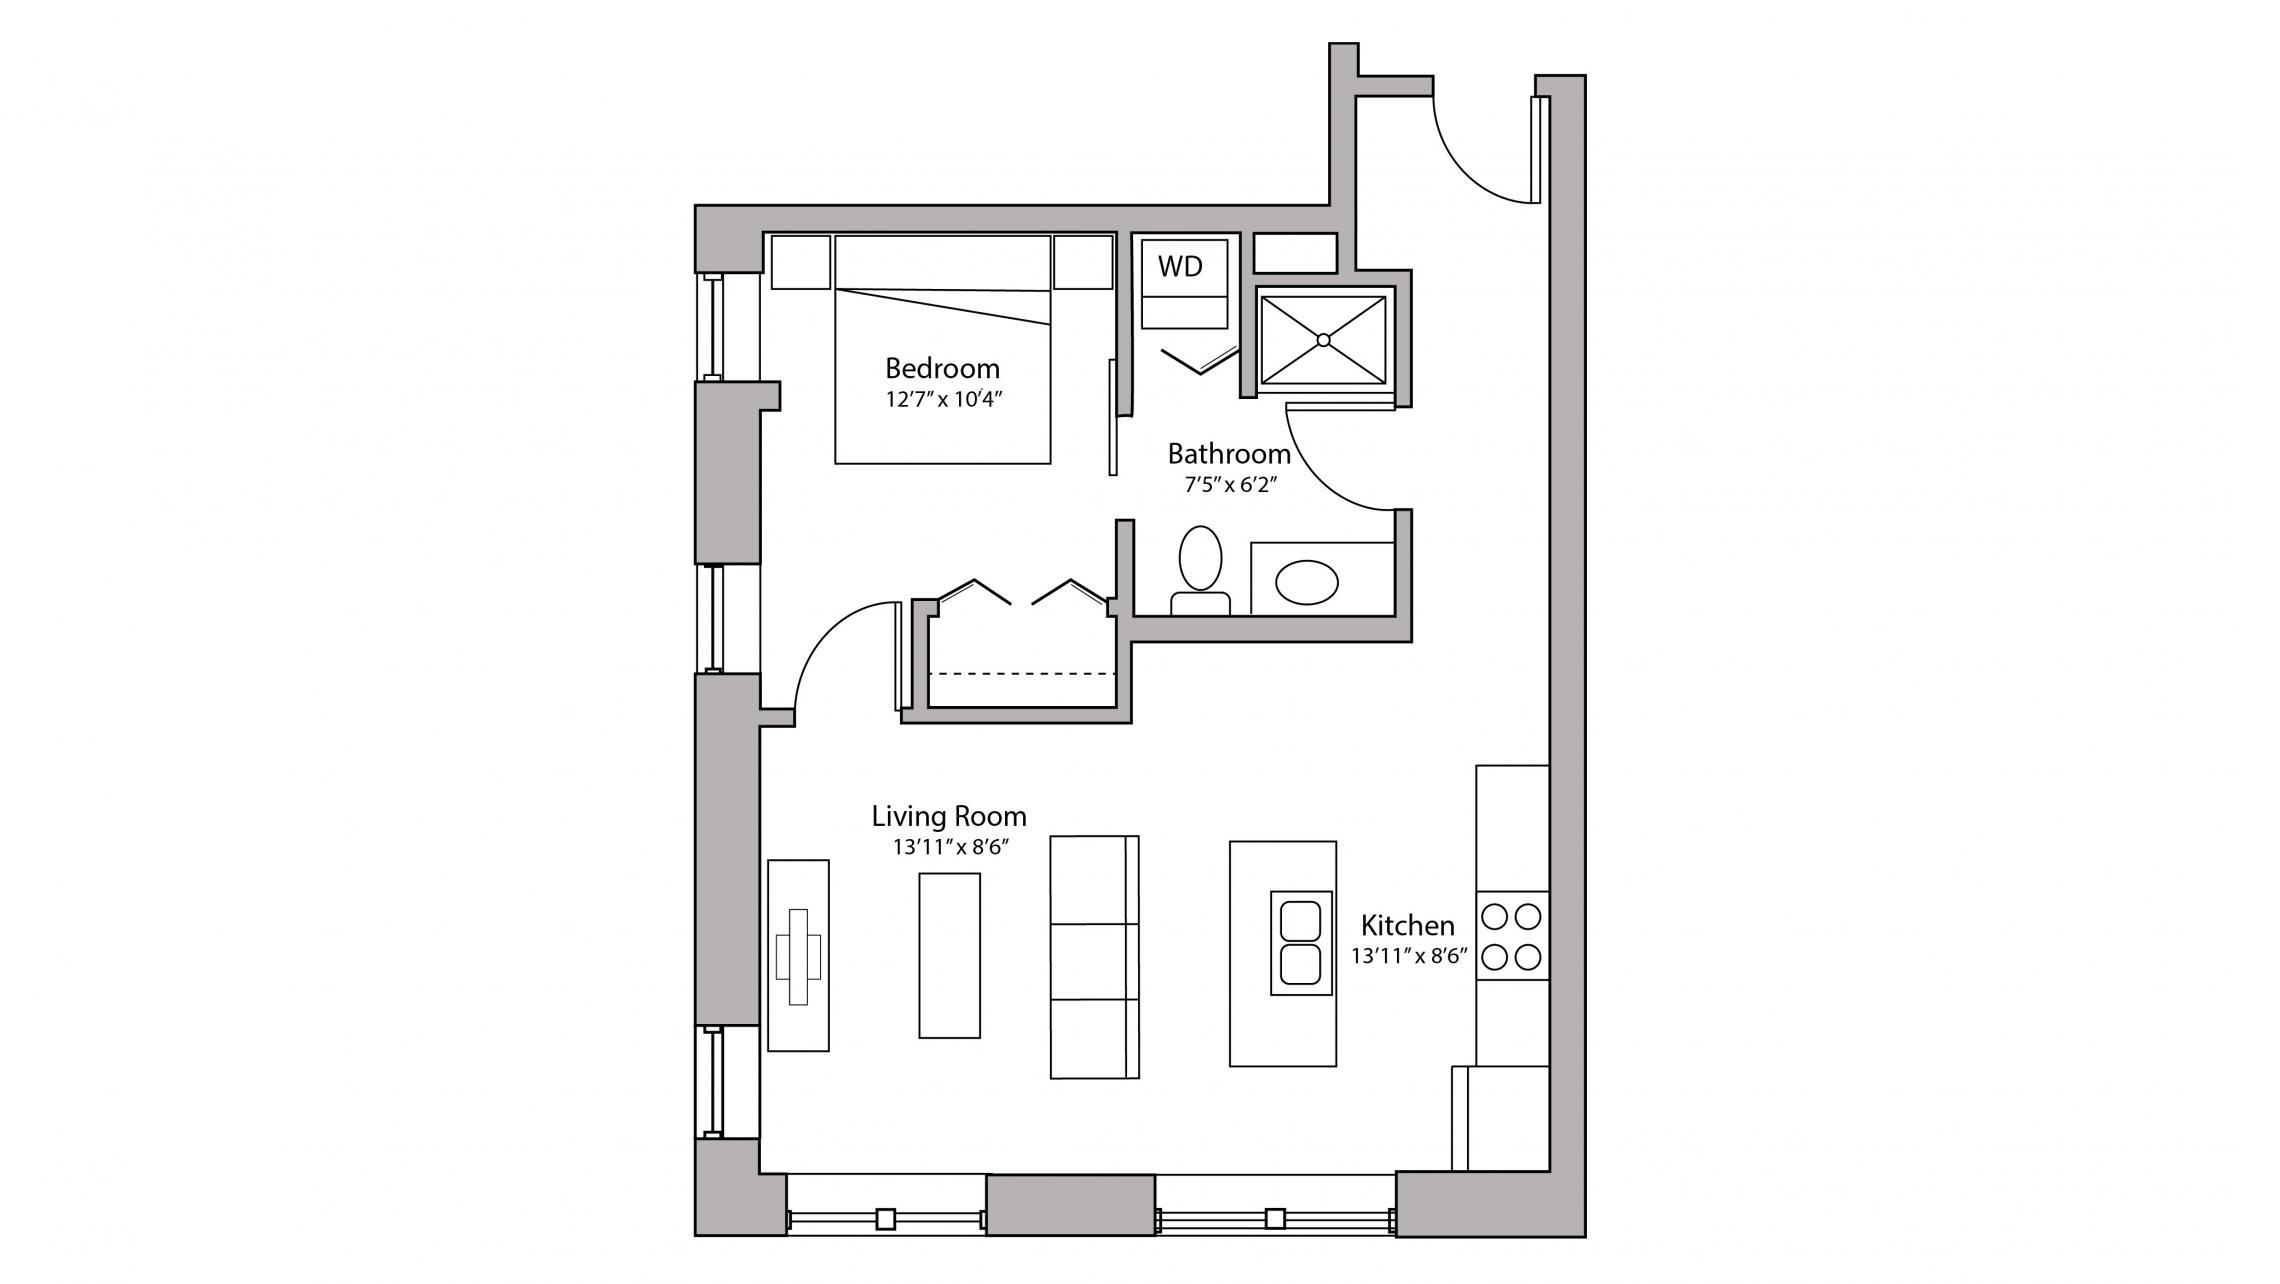 ULI Capitol Hill 407 - One Bedroom, One Bathroom Floorplan